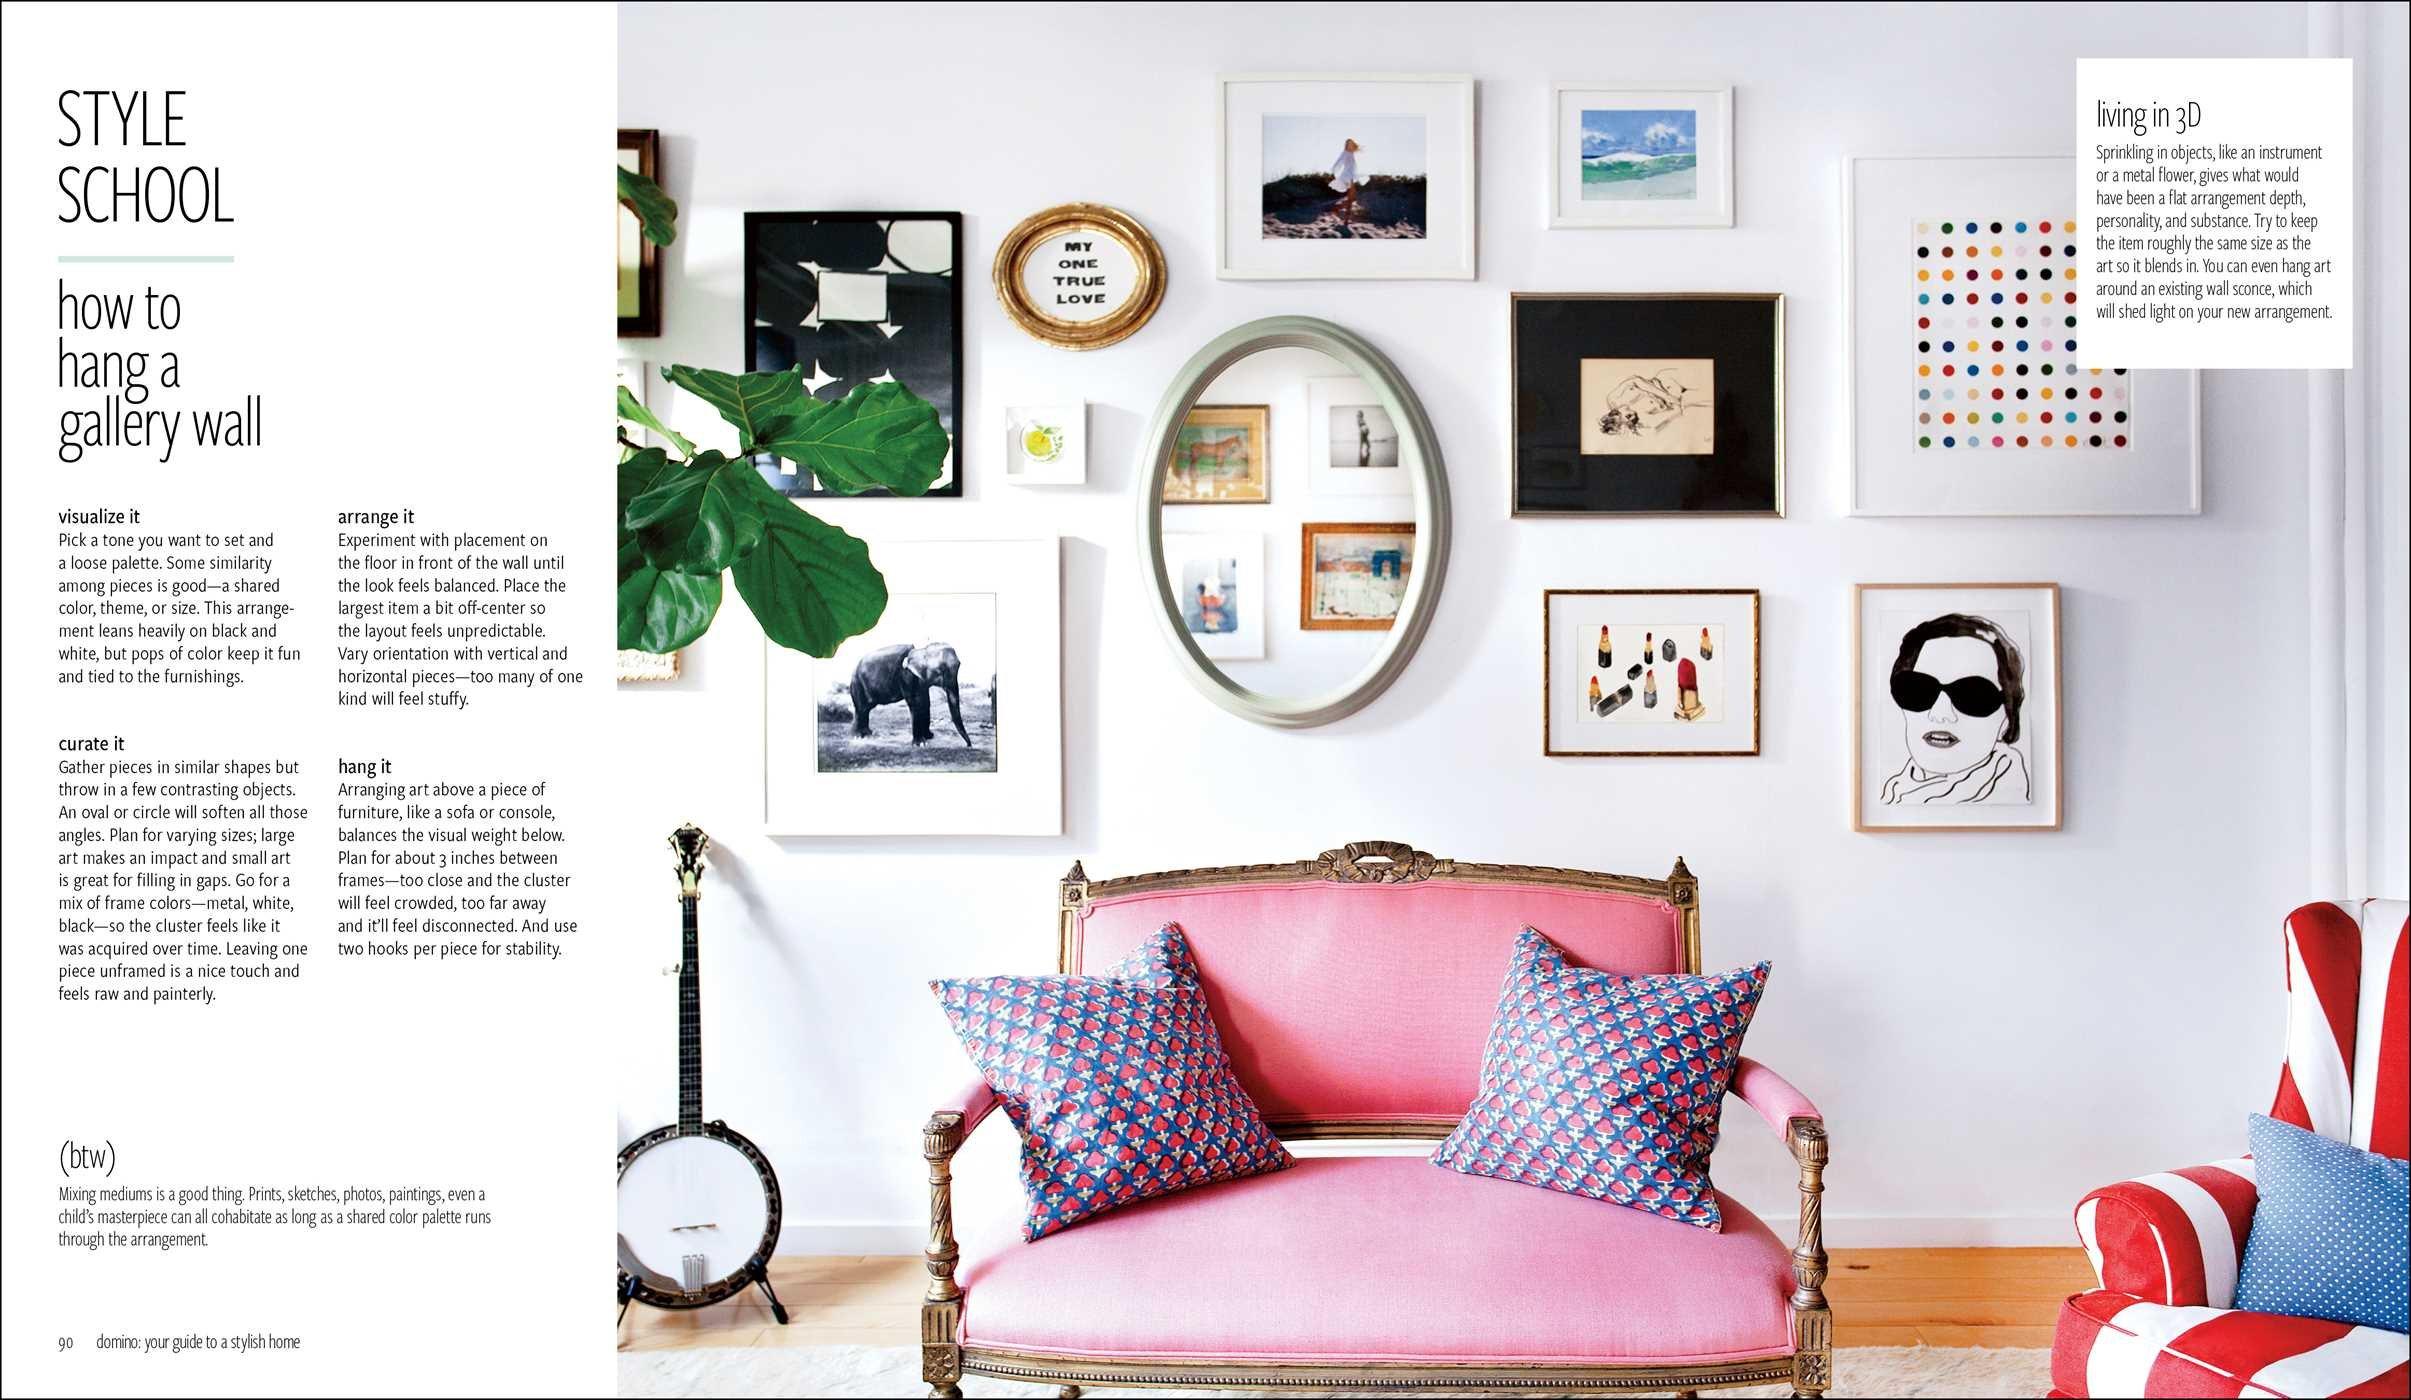 Domino Your Guide To A Stylish Home DOMINO Books Editors Of 9781501151873 Amazon